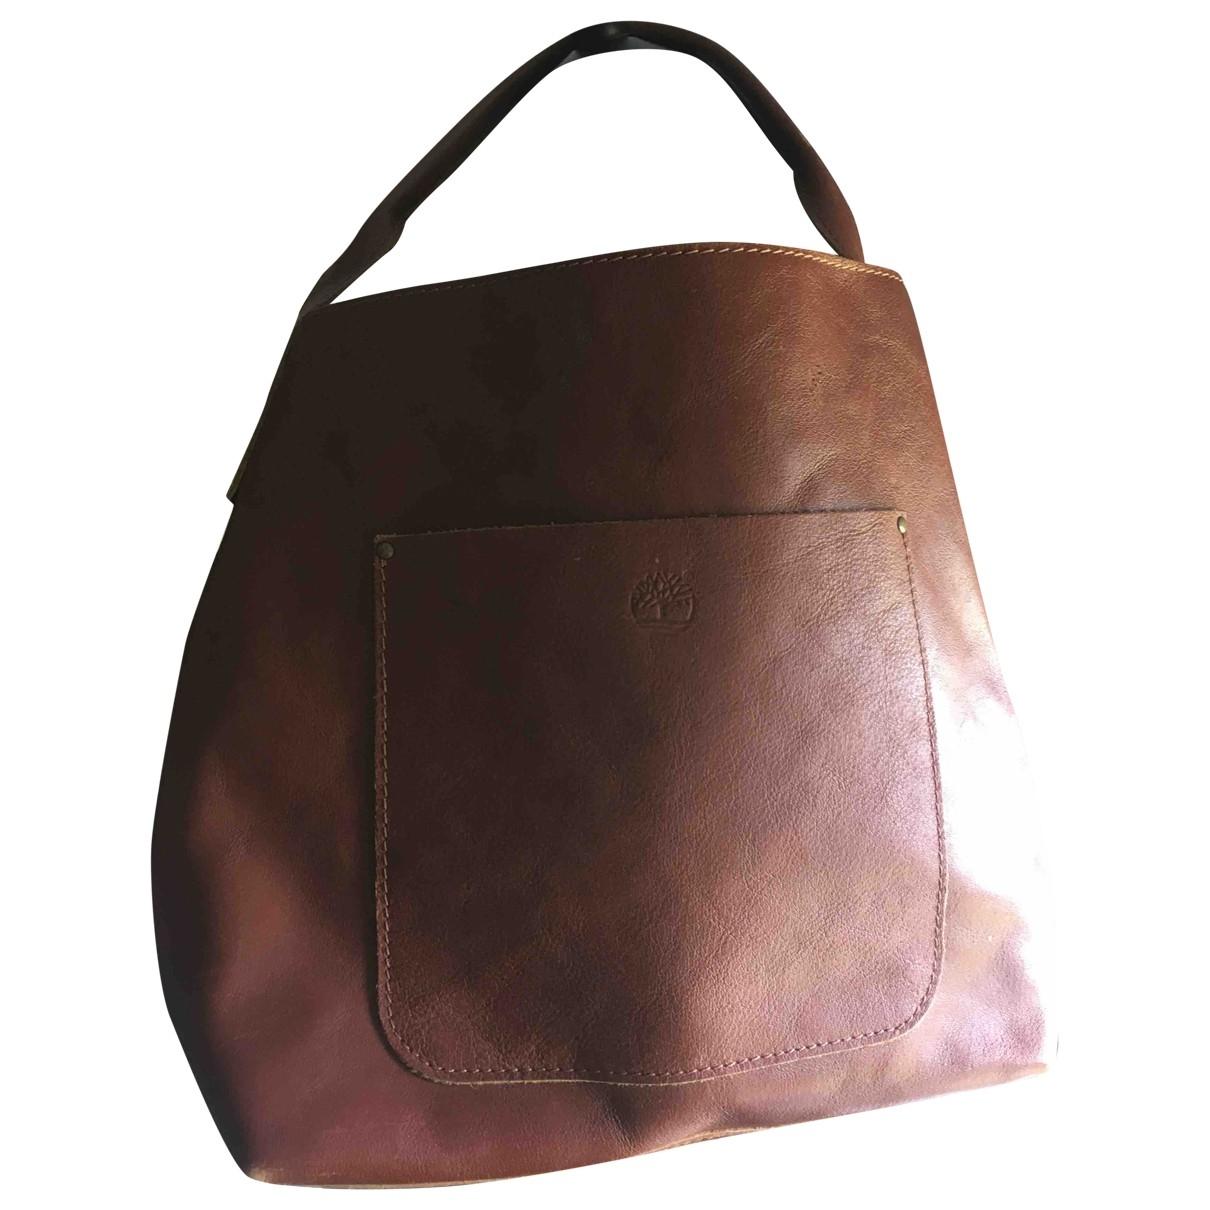 Timberland \N Brown Leather handbag for Women \N